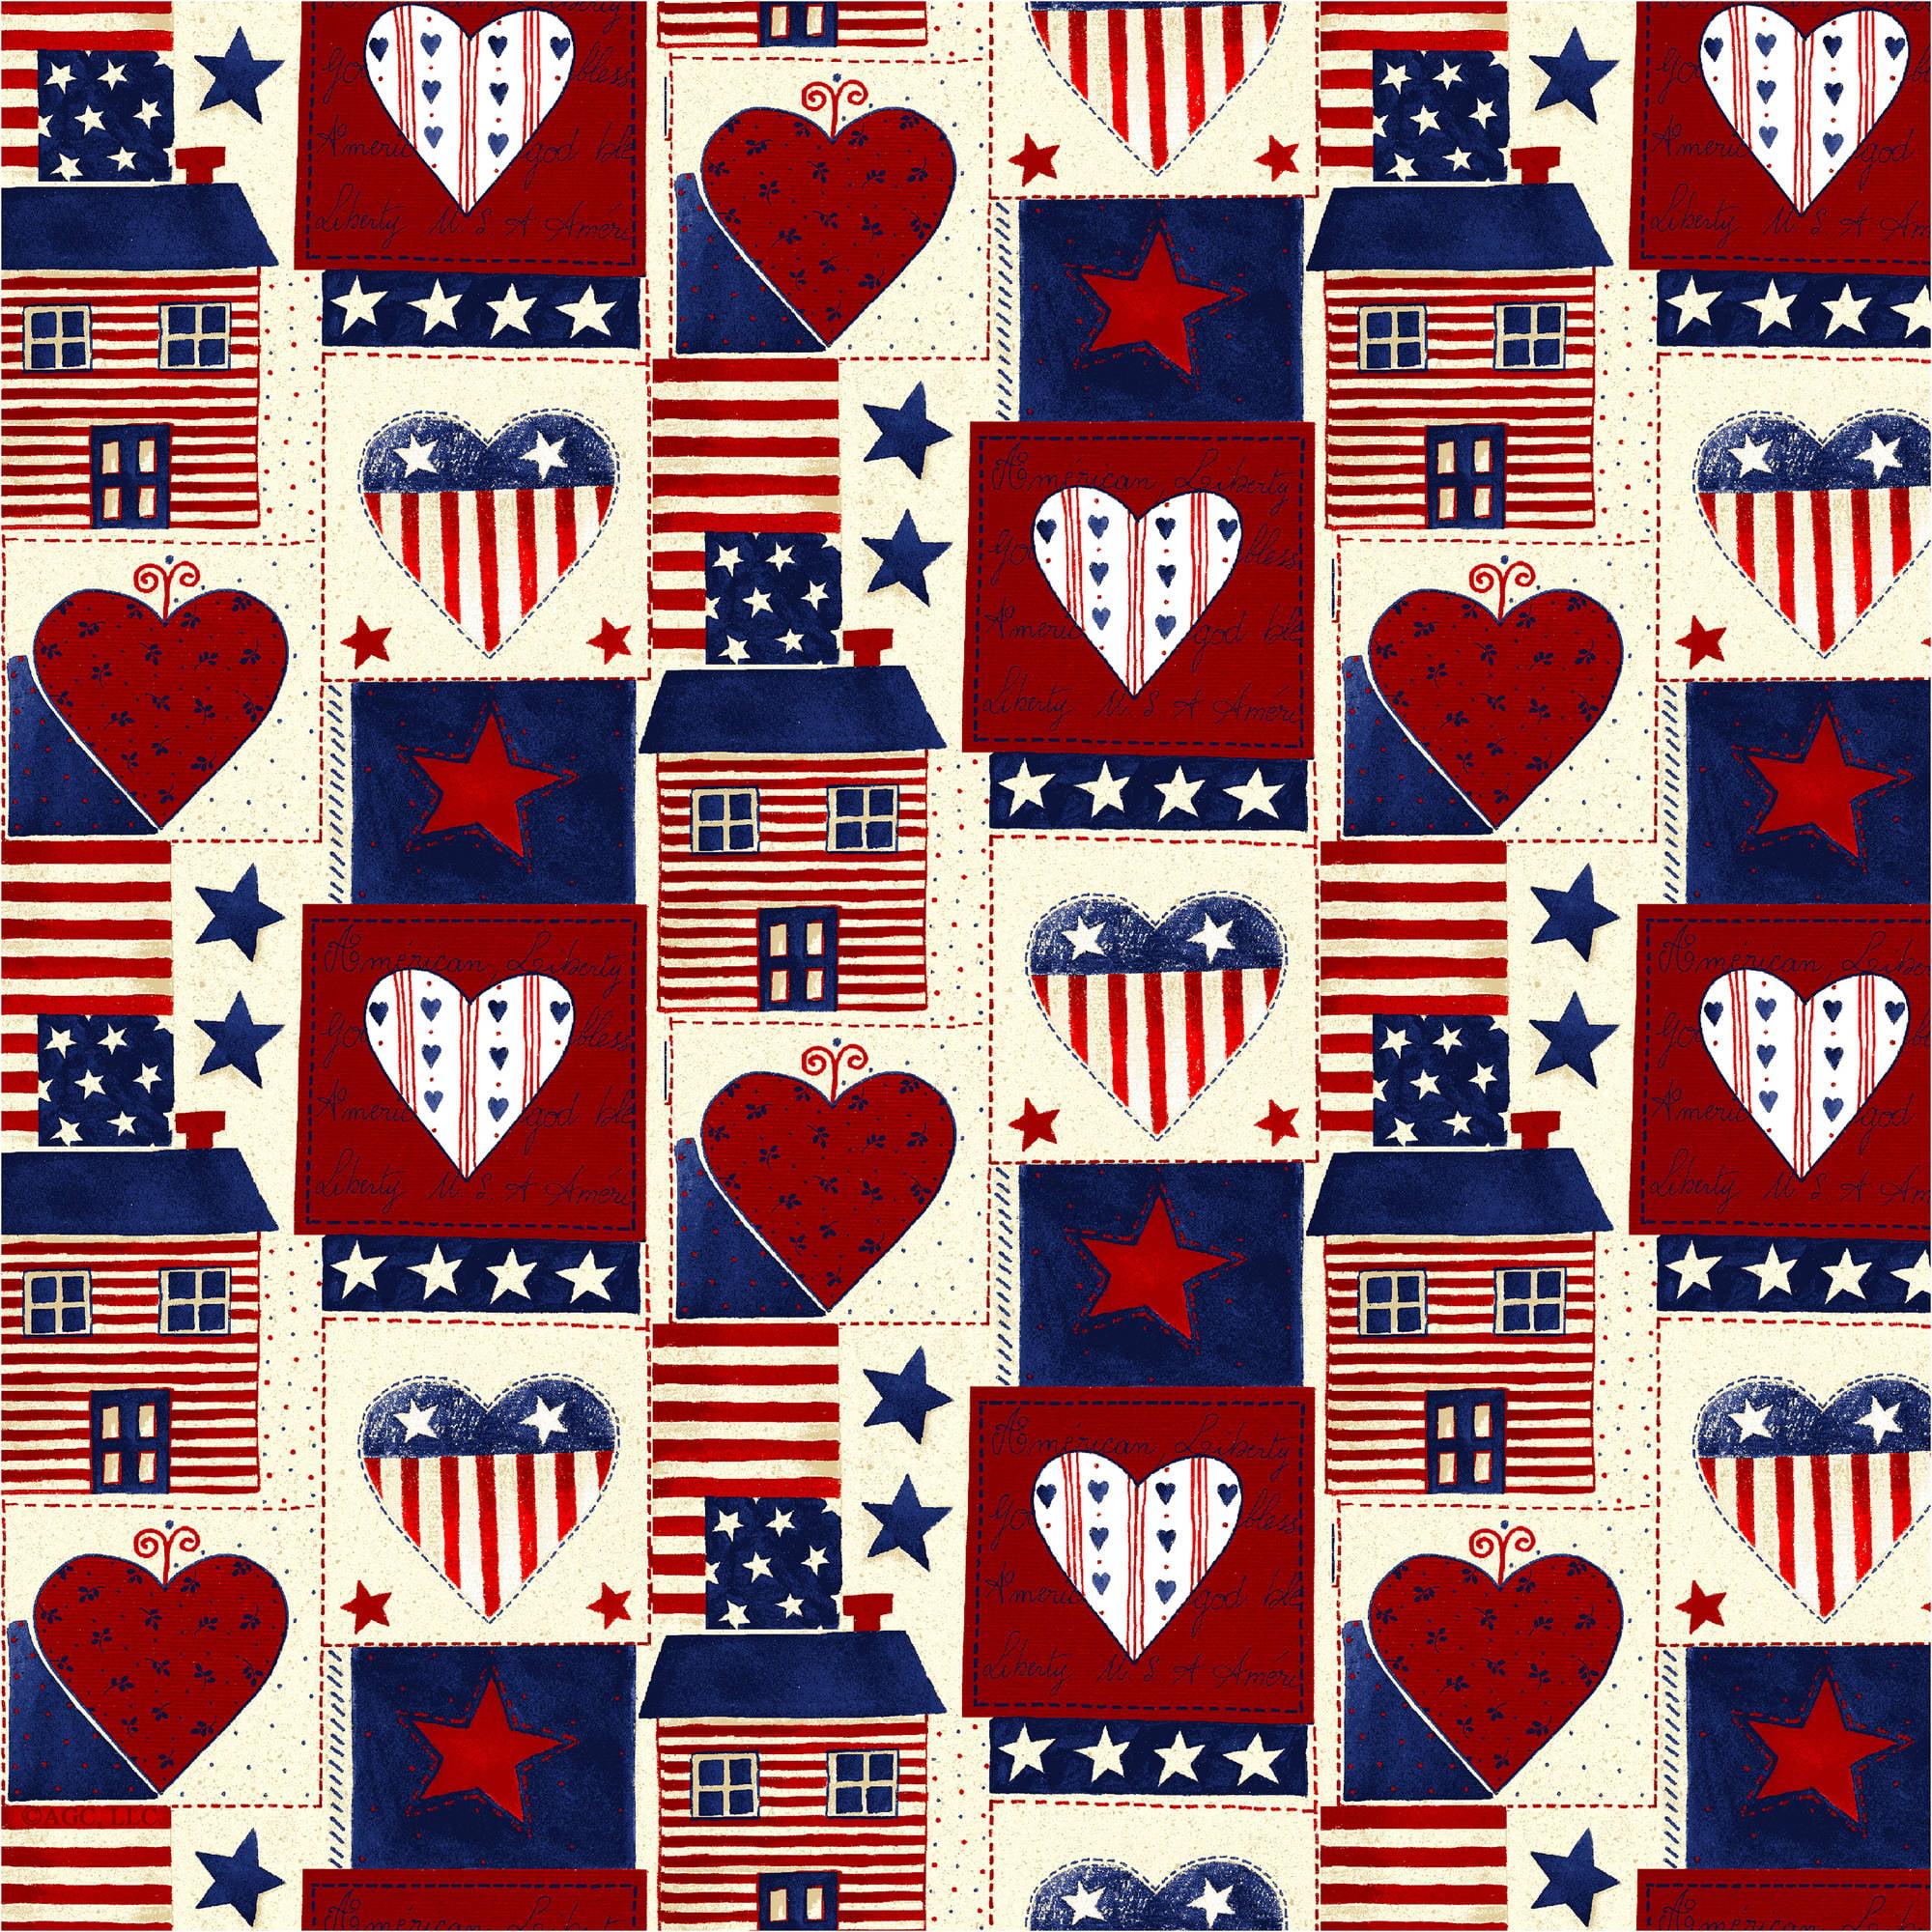 "American Greetings Cotton 36"" x 44"" Americana Heart Fabric, 1 Each"